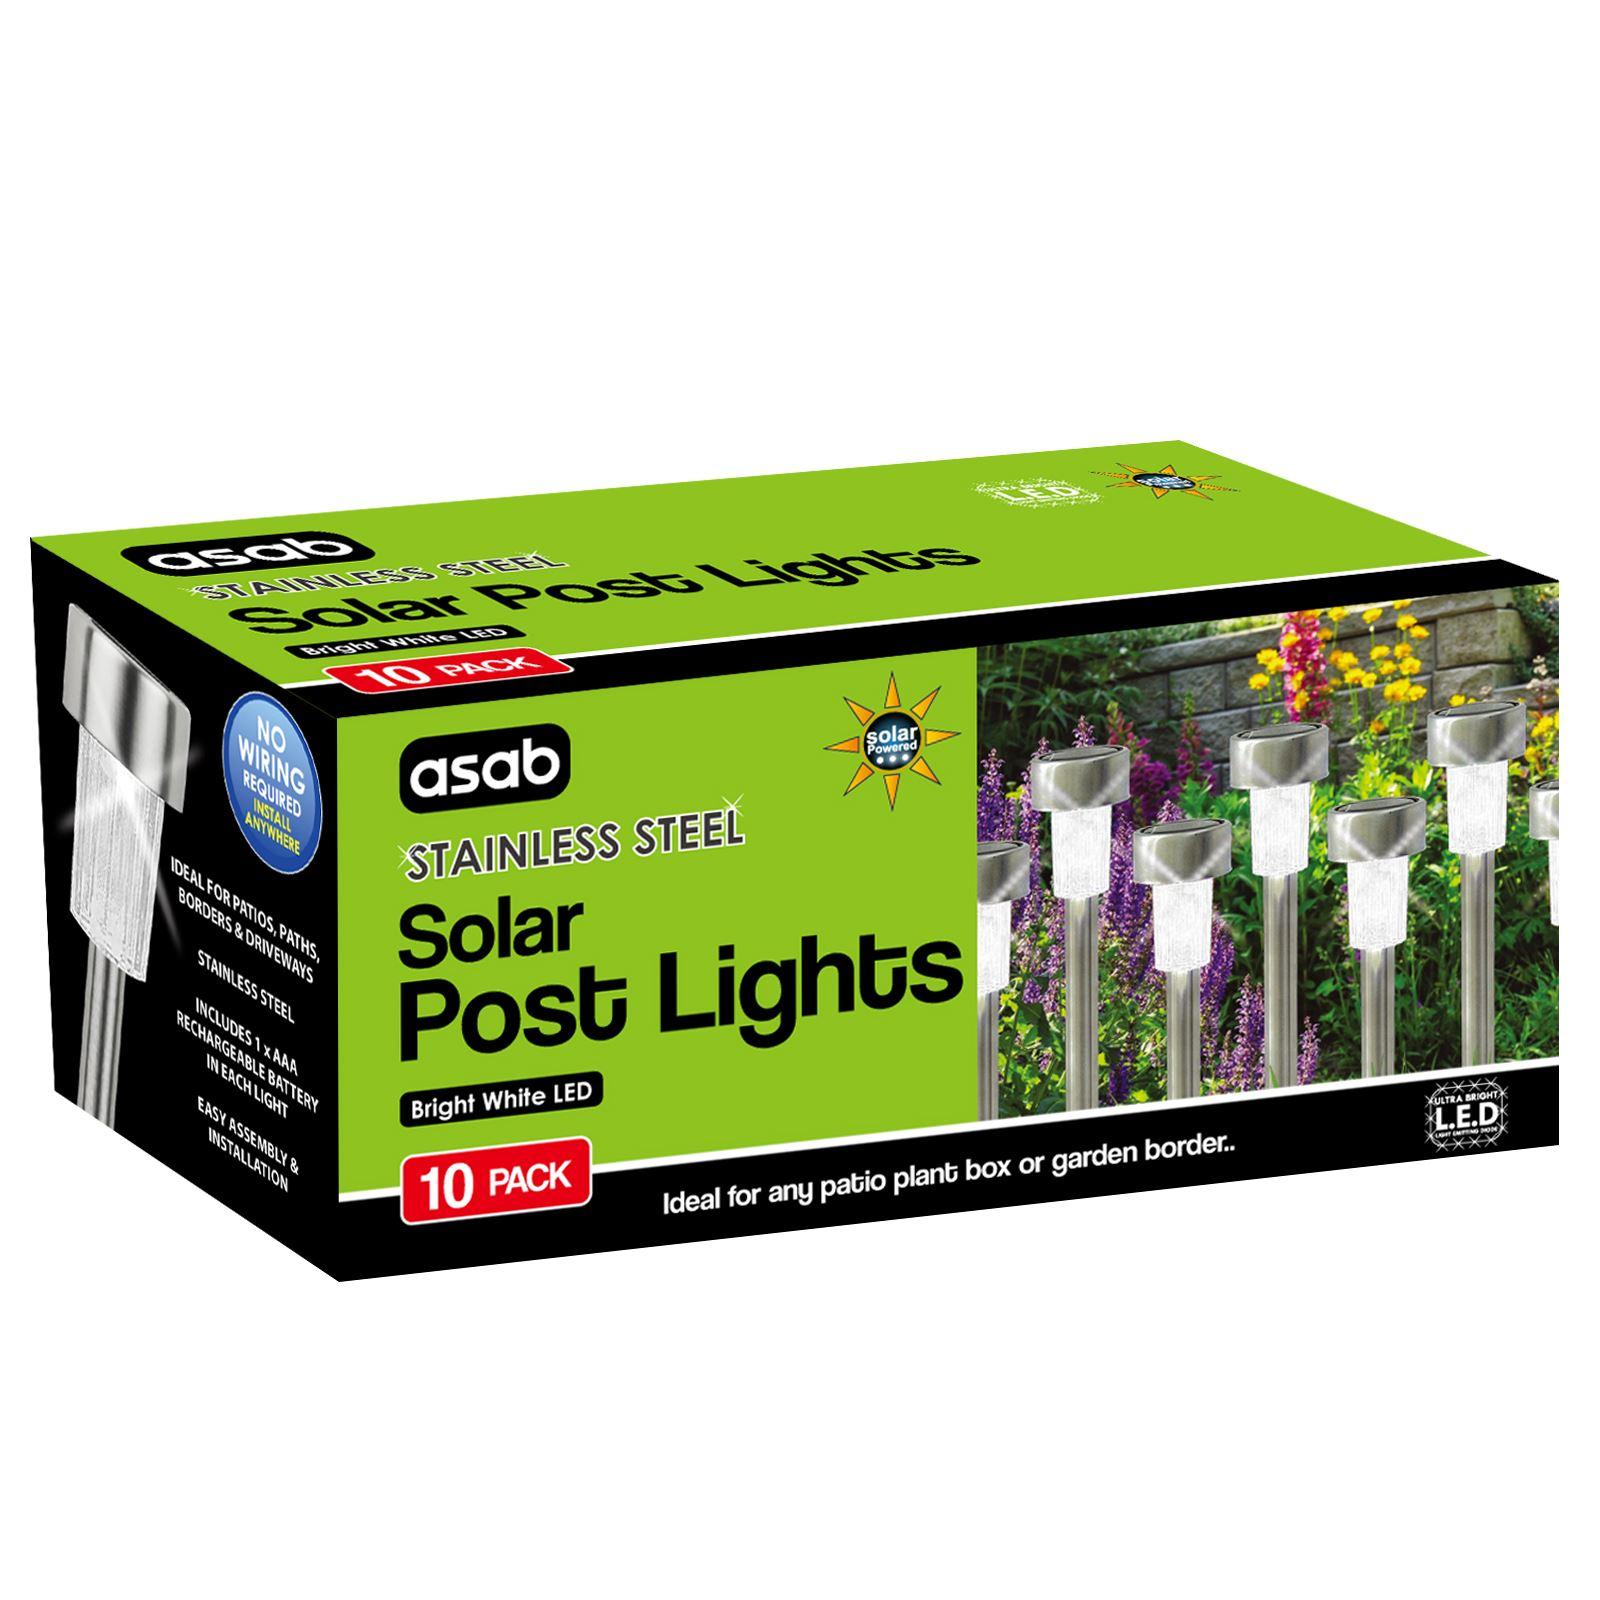 ASAB-10-x-Solar-Powered-Stainless-Steel-Garden-Post-Lights-LED-Outdoor-Lighting thumbnail 22